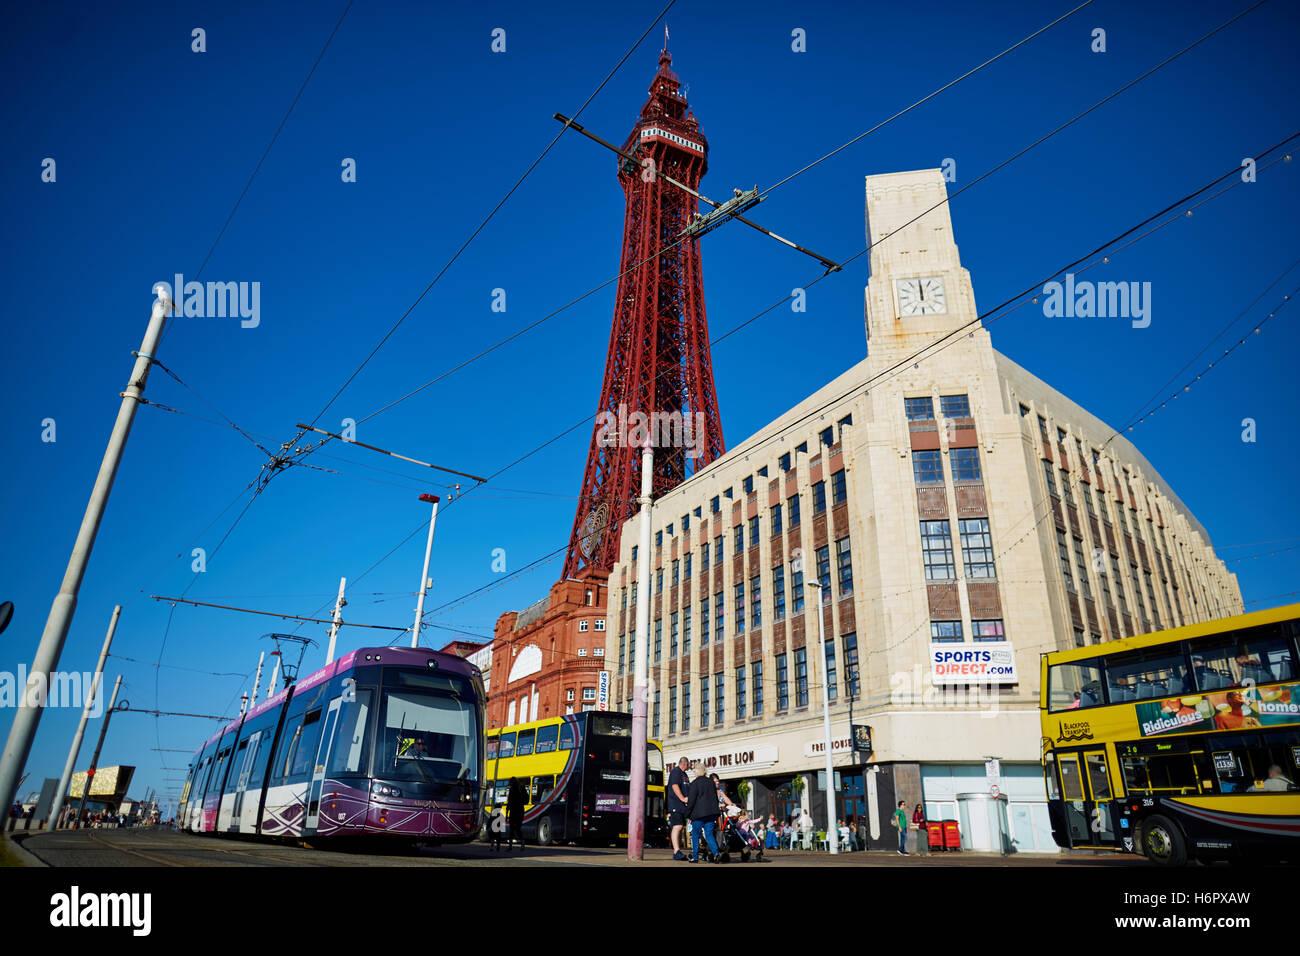 Blackpool Ftower moderne Straßenbahn Stadtbahn Urlaub Meer Seite Resort Lancashire Sehenswürdigkeiten Stockbild